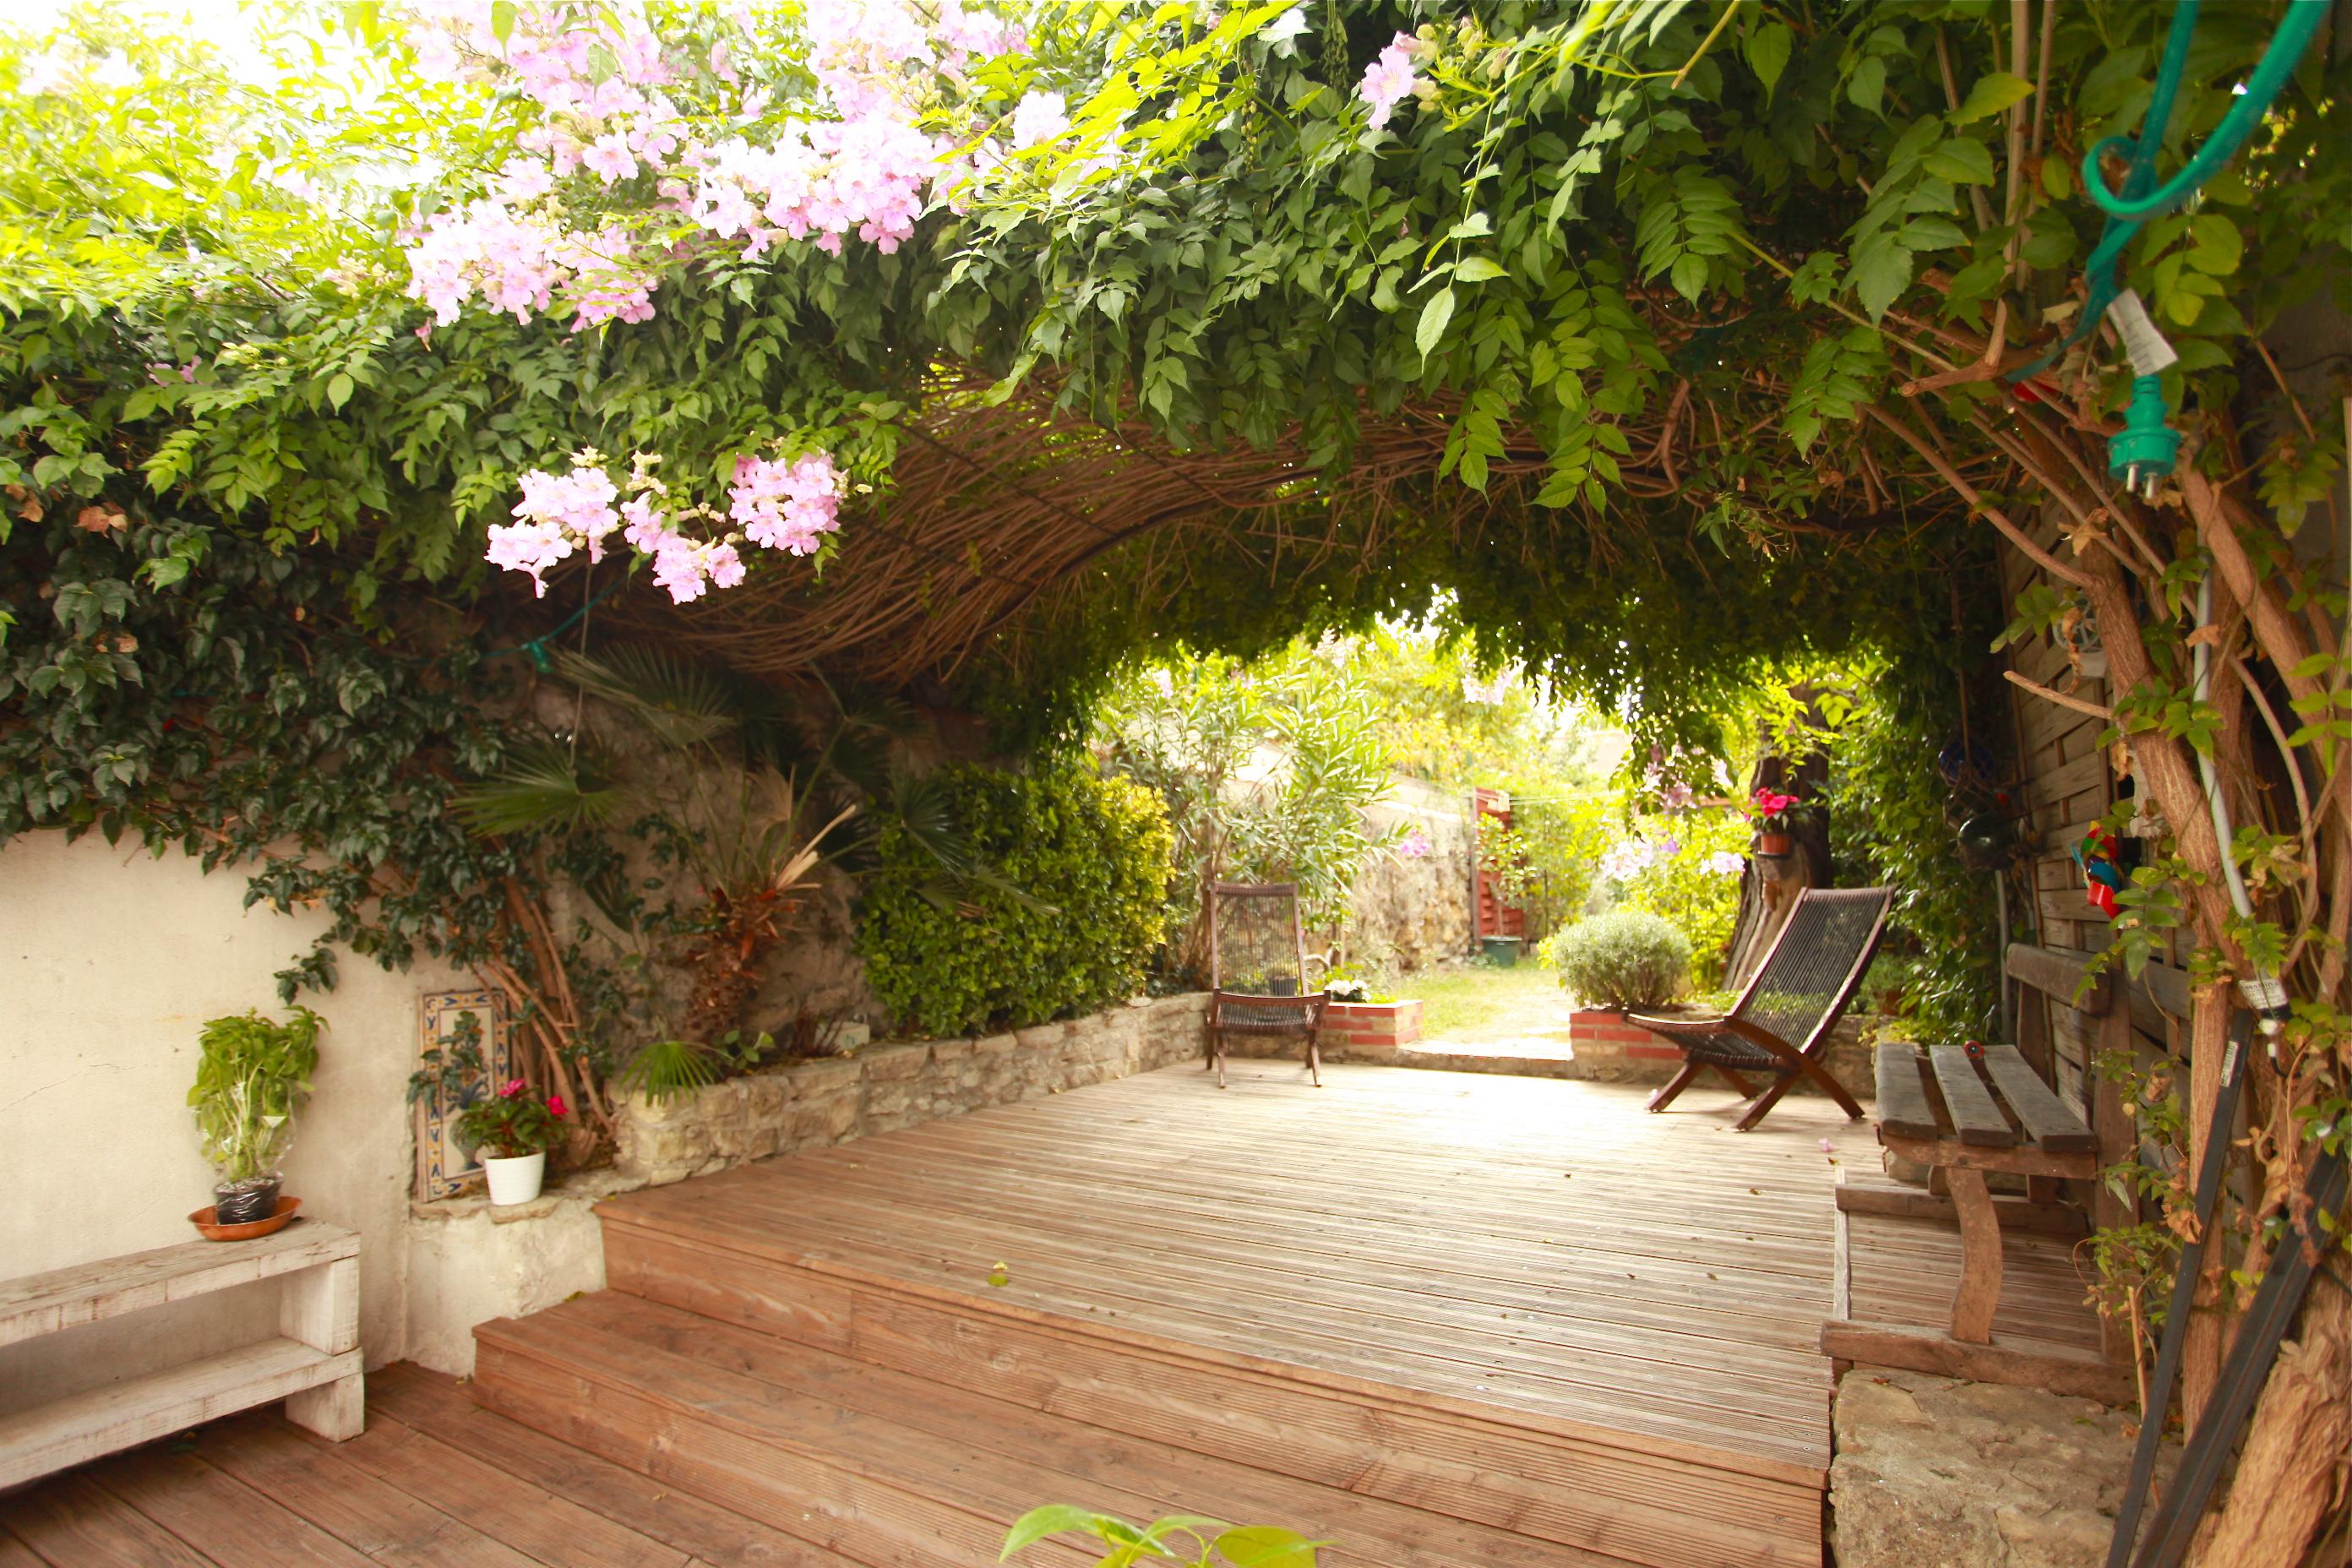 VENDU  - Maison + dépendance + jardin - 315 000 €